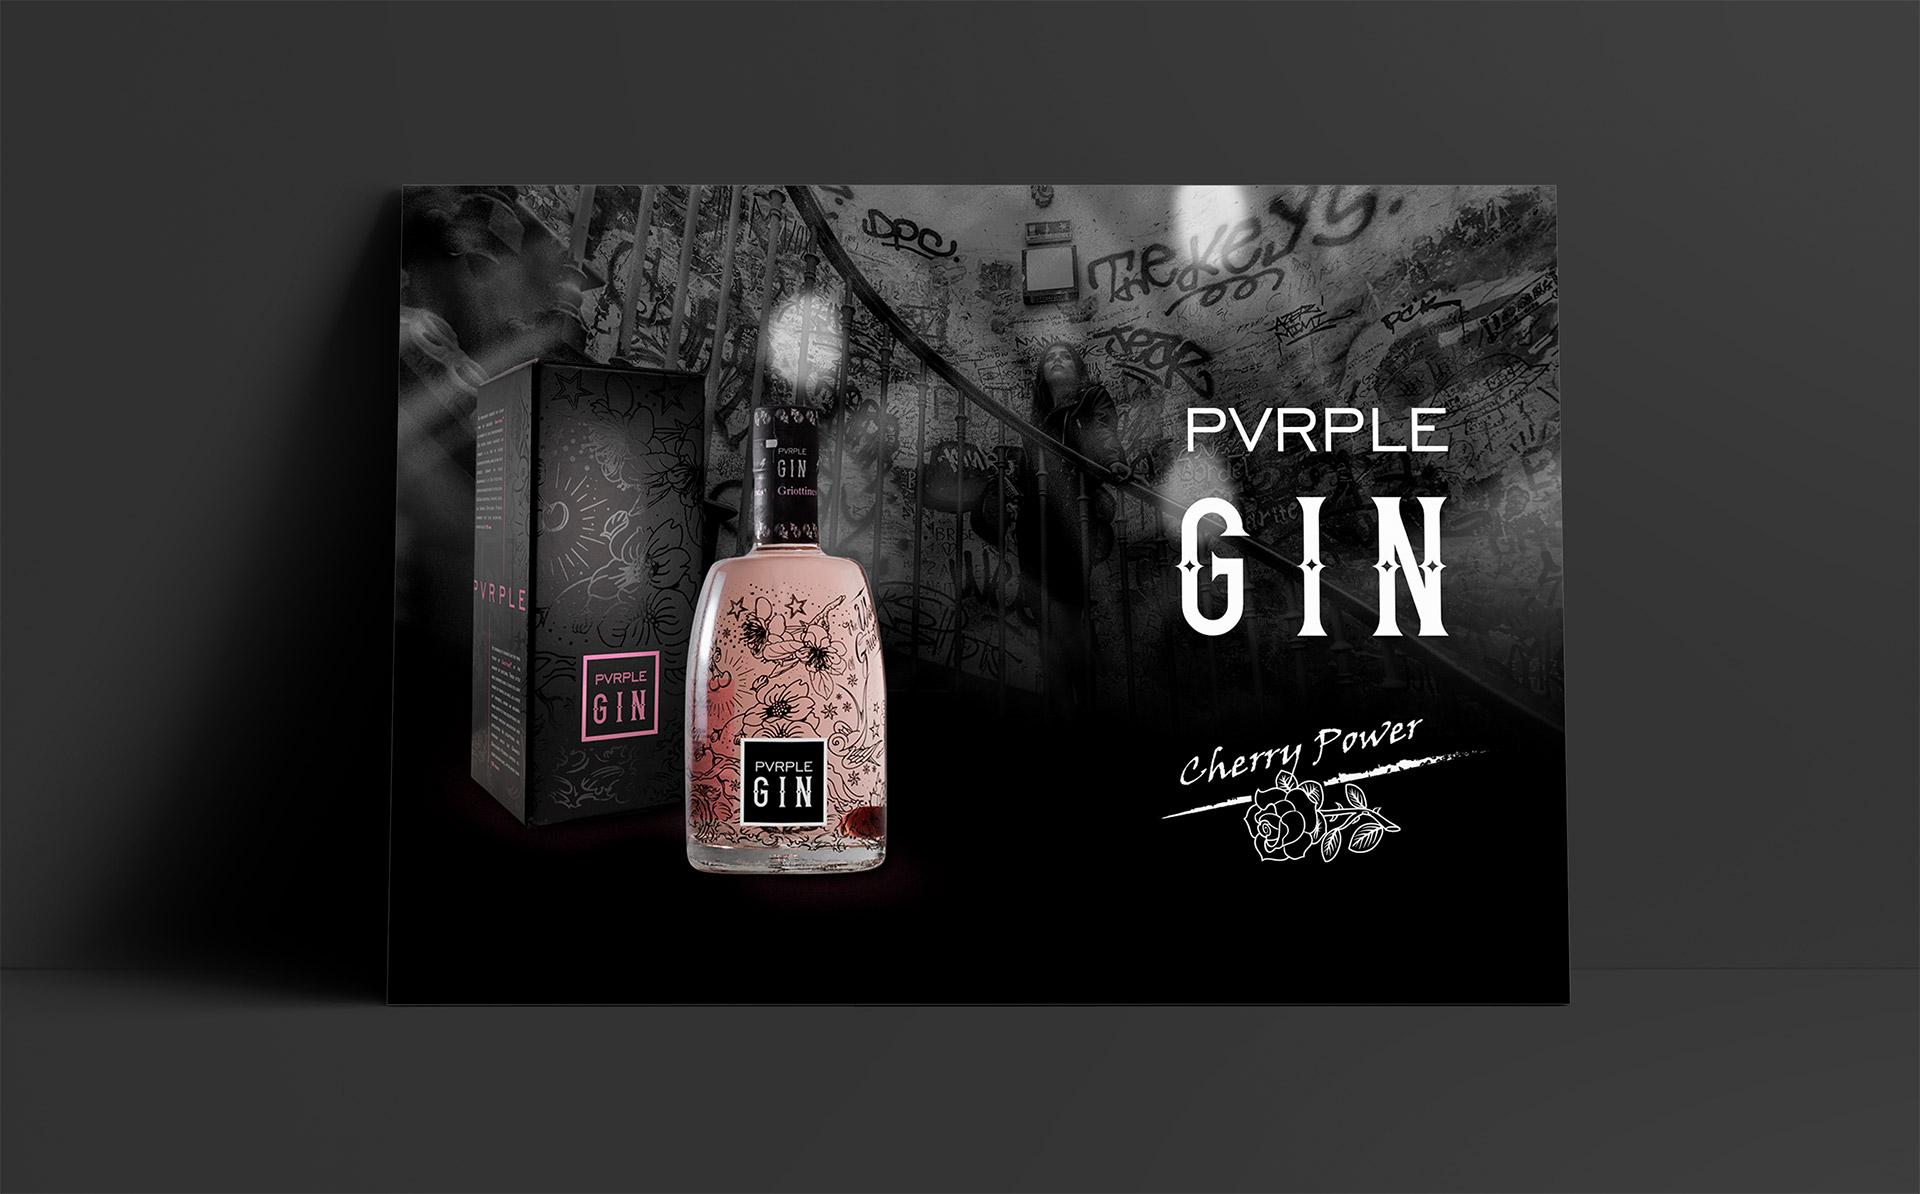 Claim Pvrple Gin